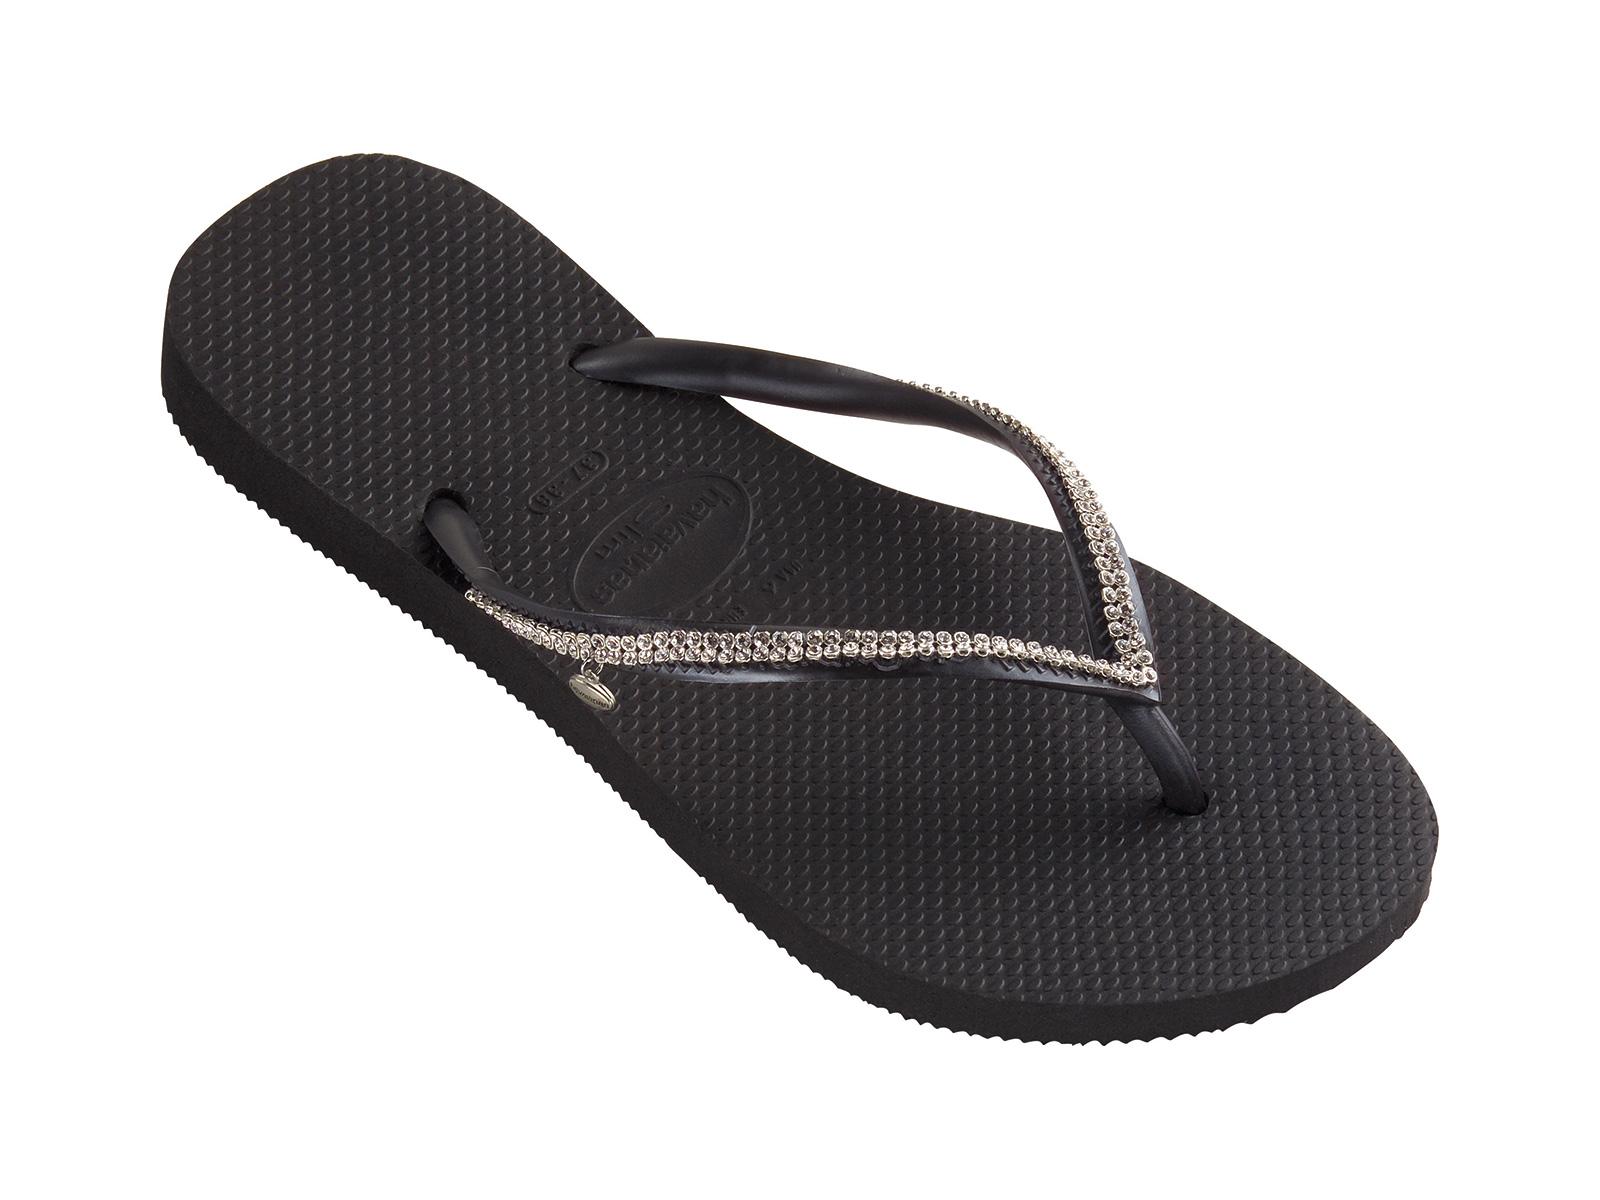 989a636f3fae Black Flip-flops With Swarovski Crystals - Slim Crystal Mesh Sw Black -  Havaianas